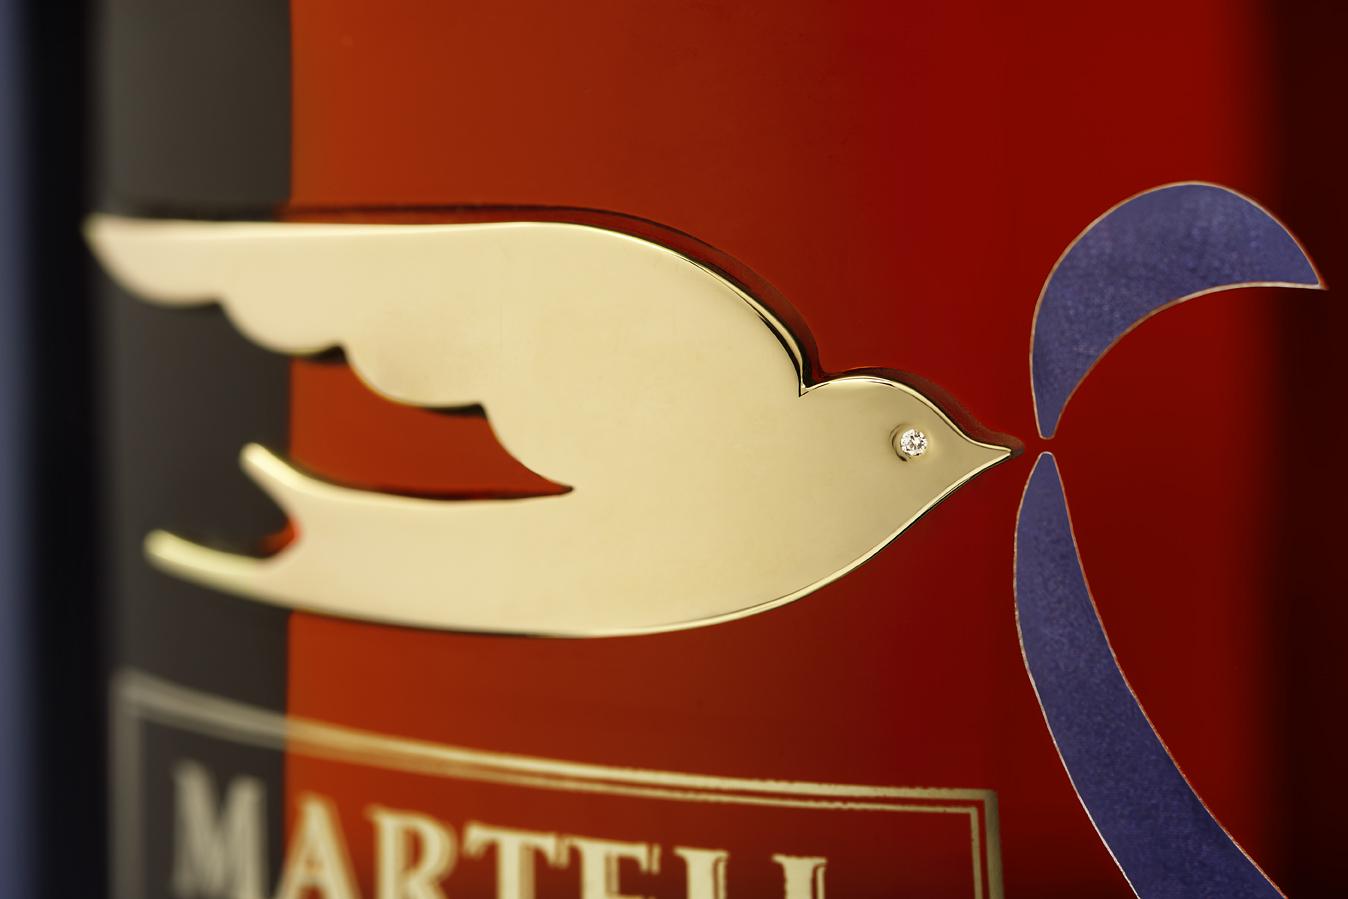 Martell Cordon Bleu Cognac – Centenary Film Celebration